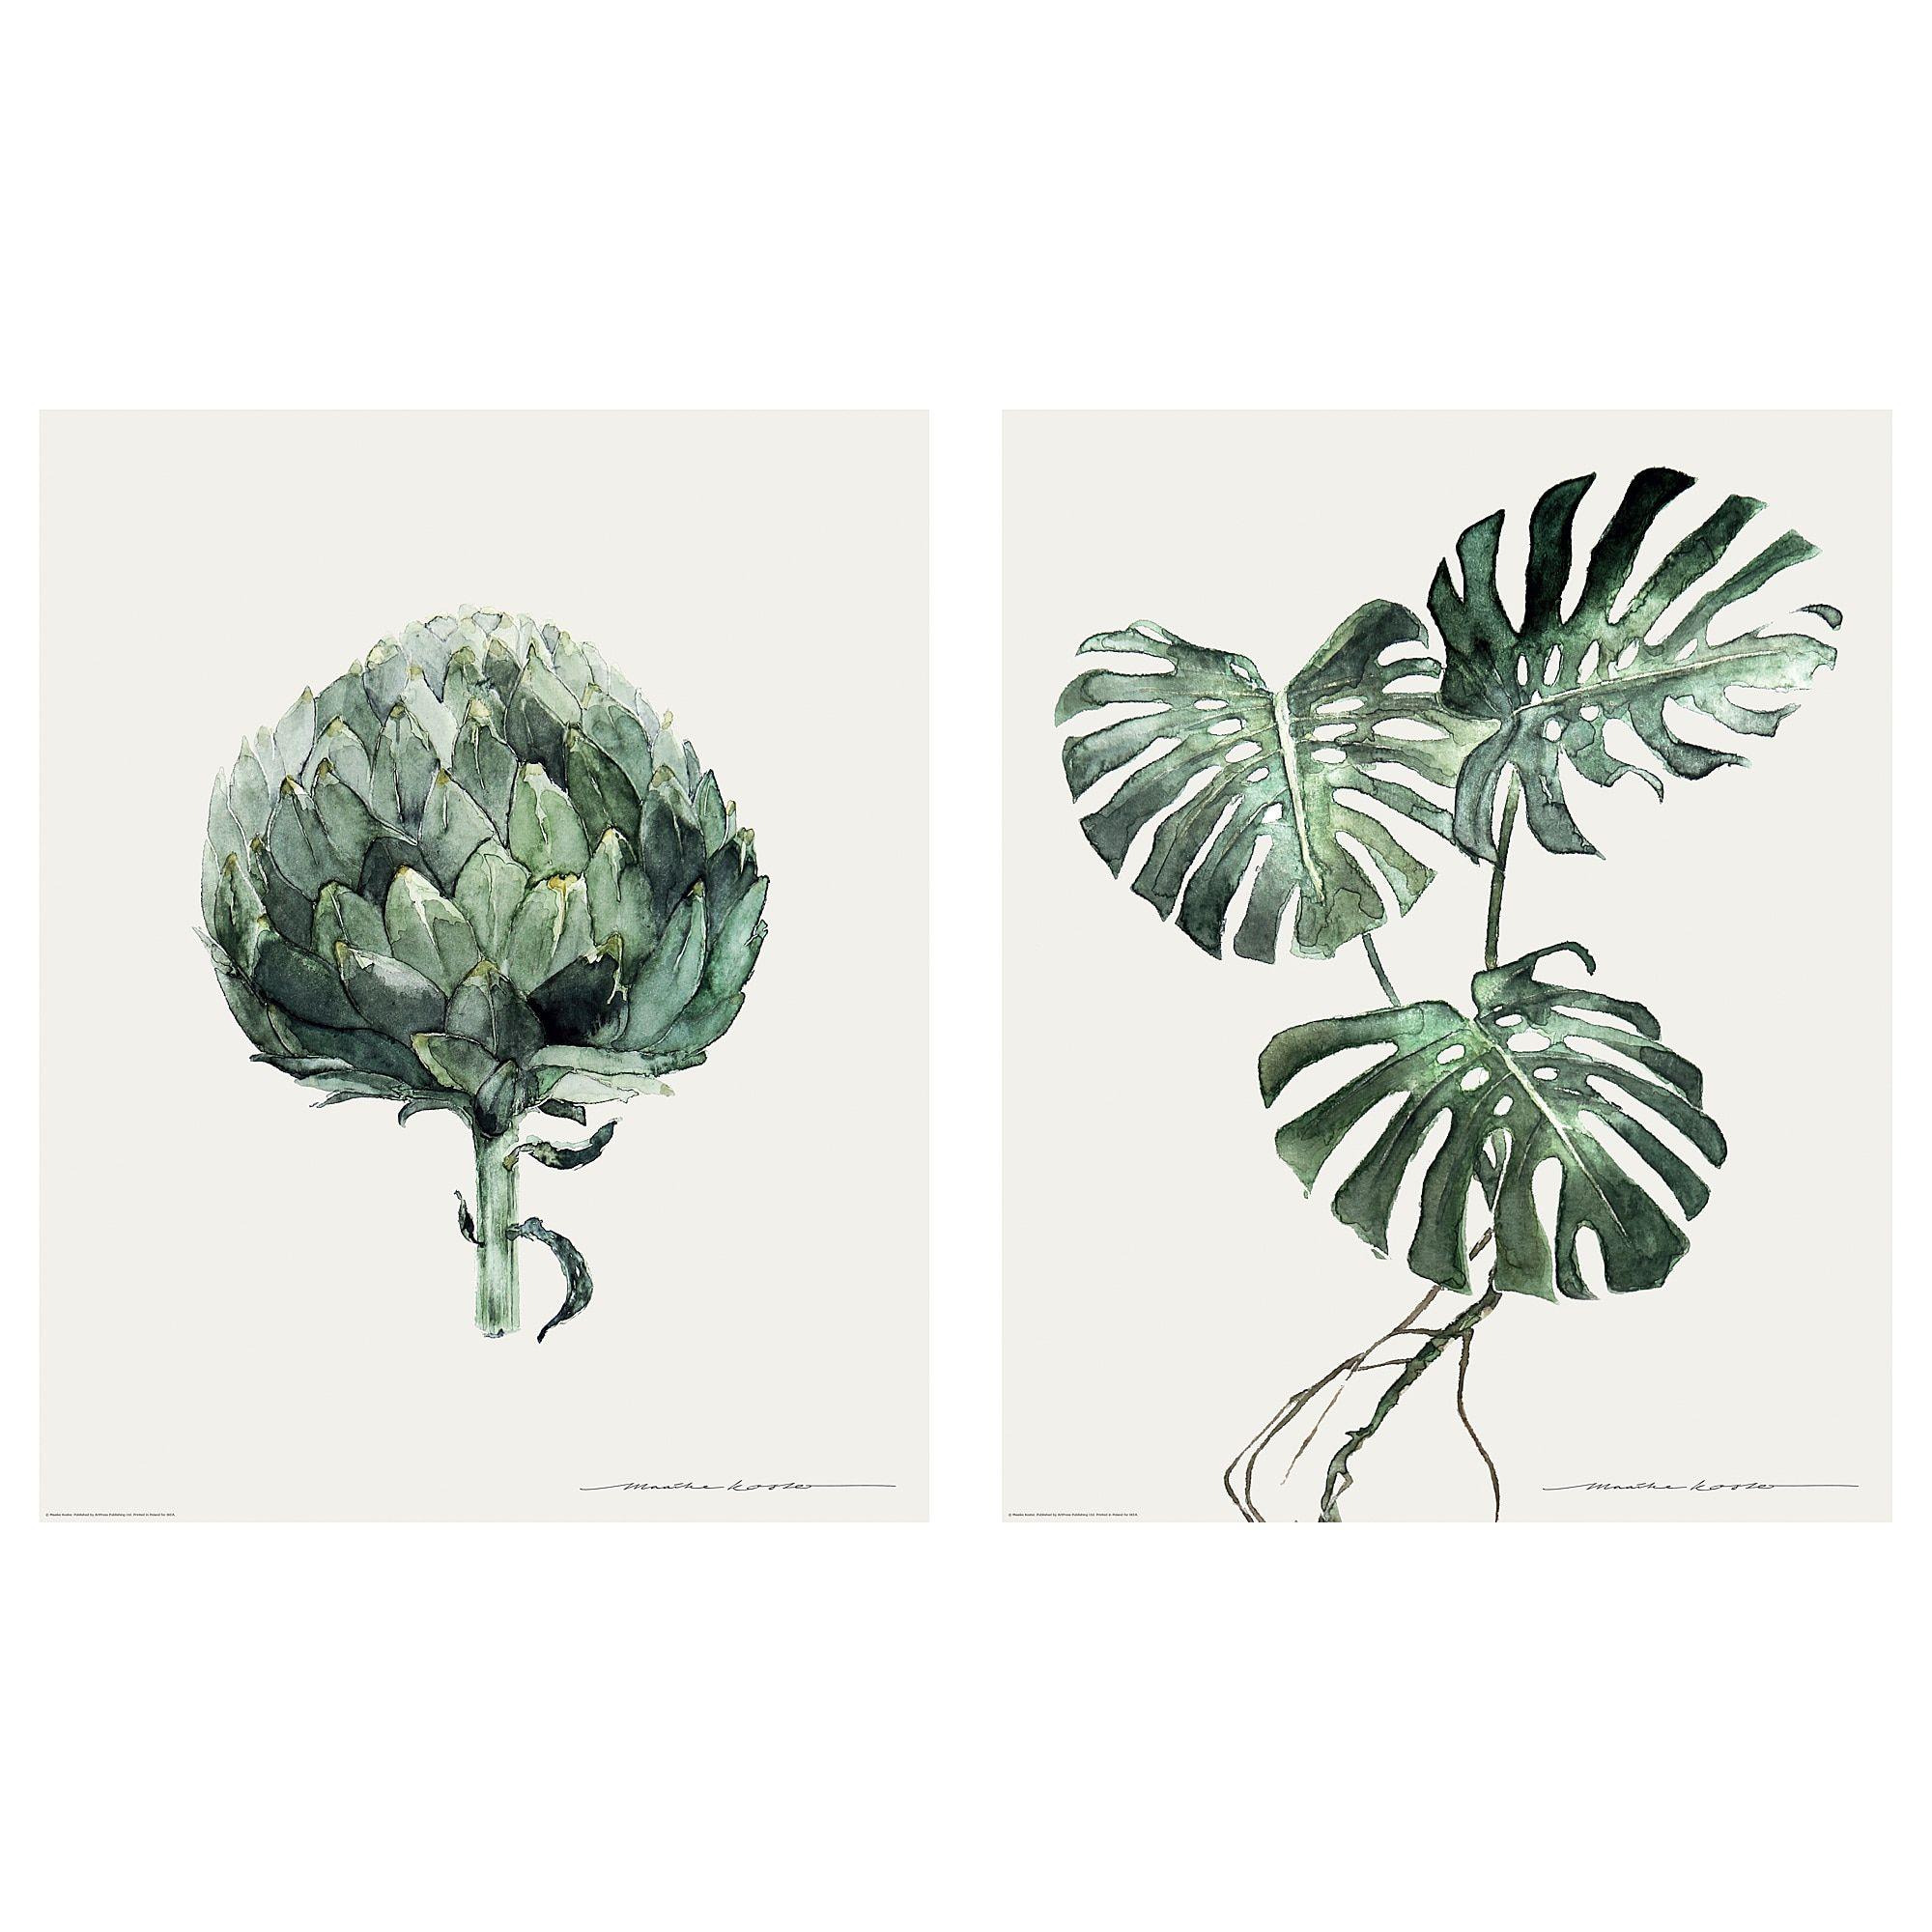 Moveis E Decoracao Nao Ha Casa Como A Nossa Ikea Ikea Plants Hanging Plants Picture Frame Wall